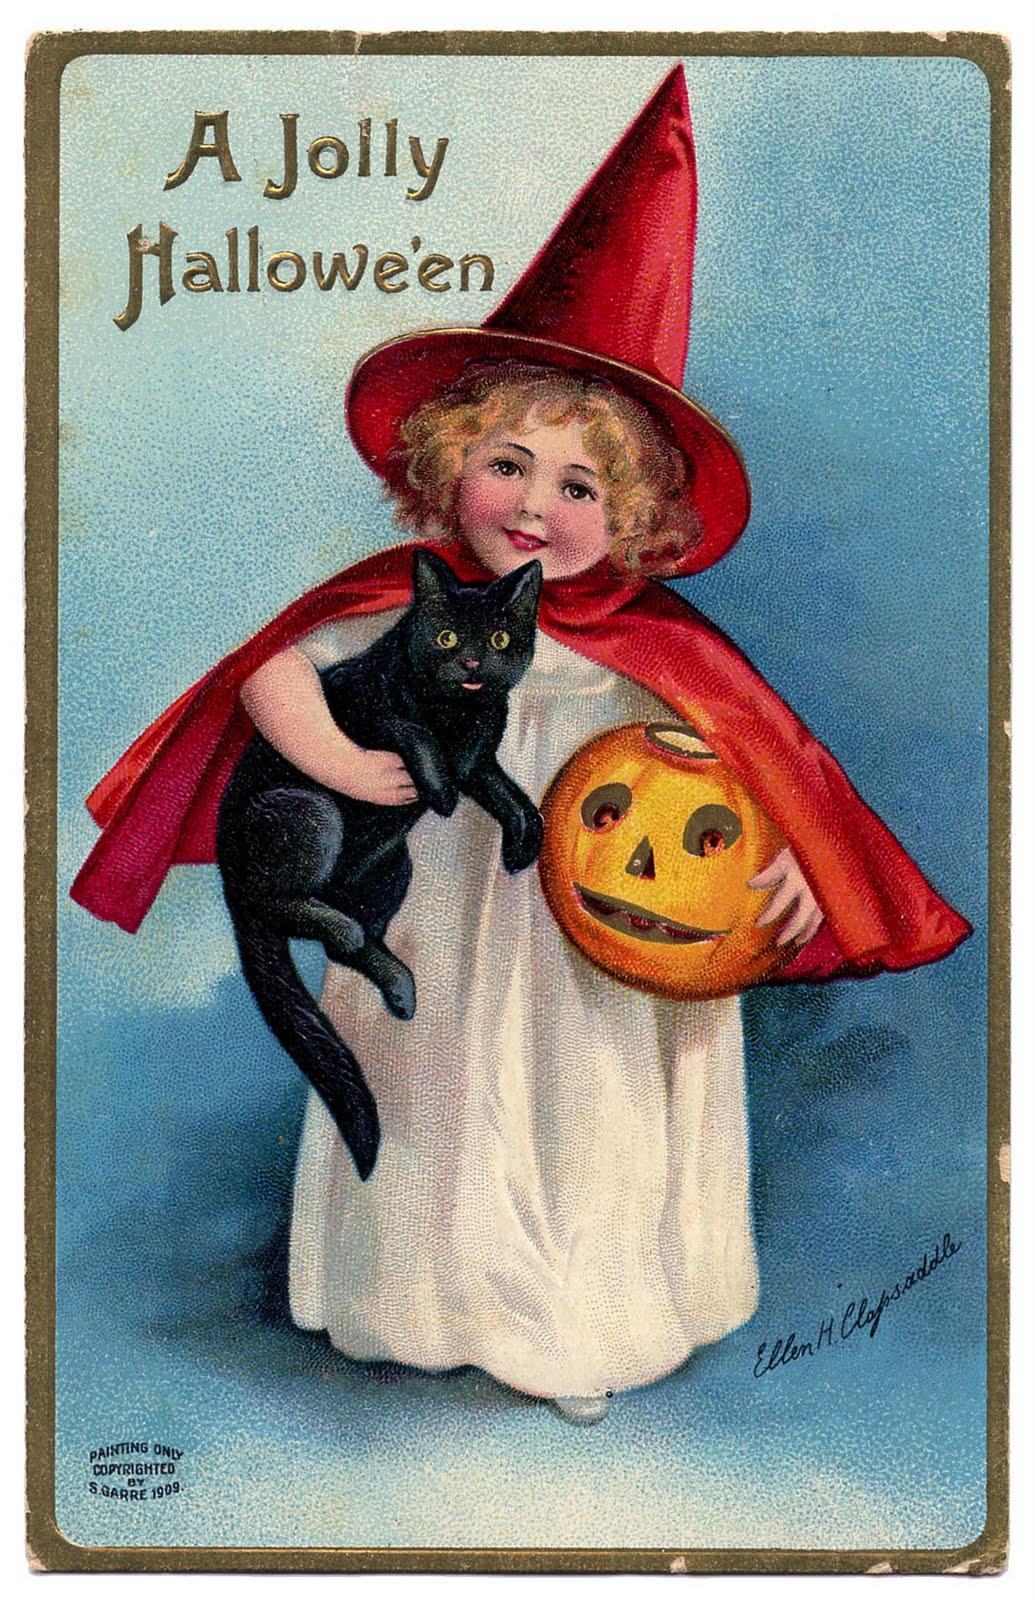 Vintage Halloween Clip Art - Darling Little Witch Girl ...